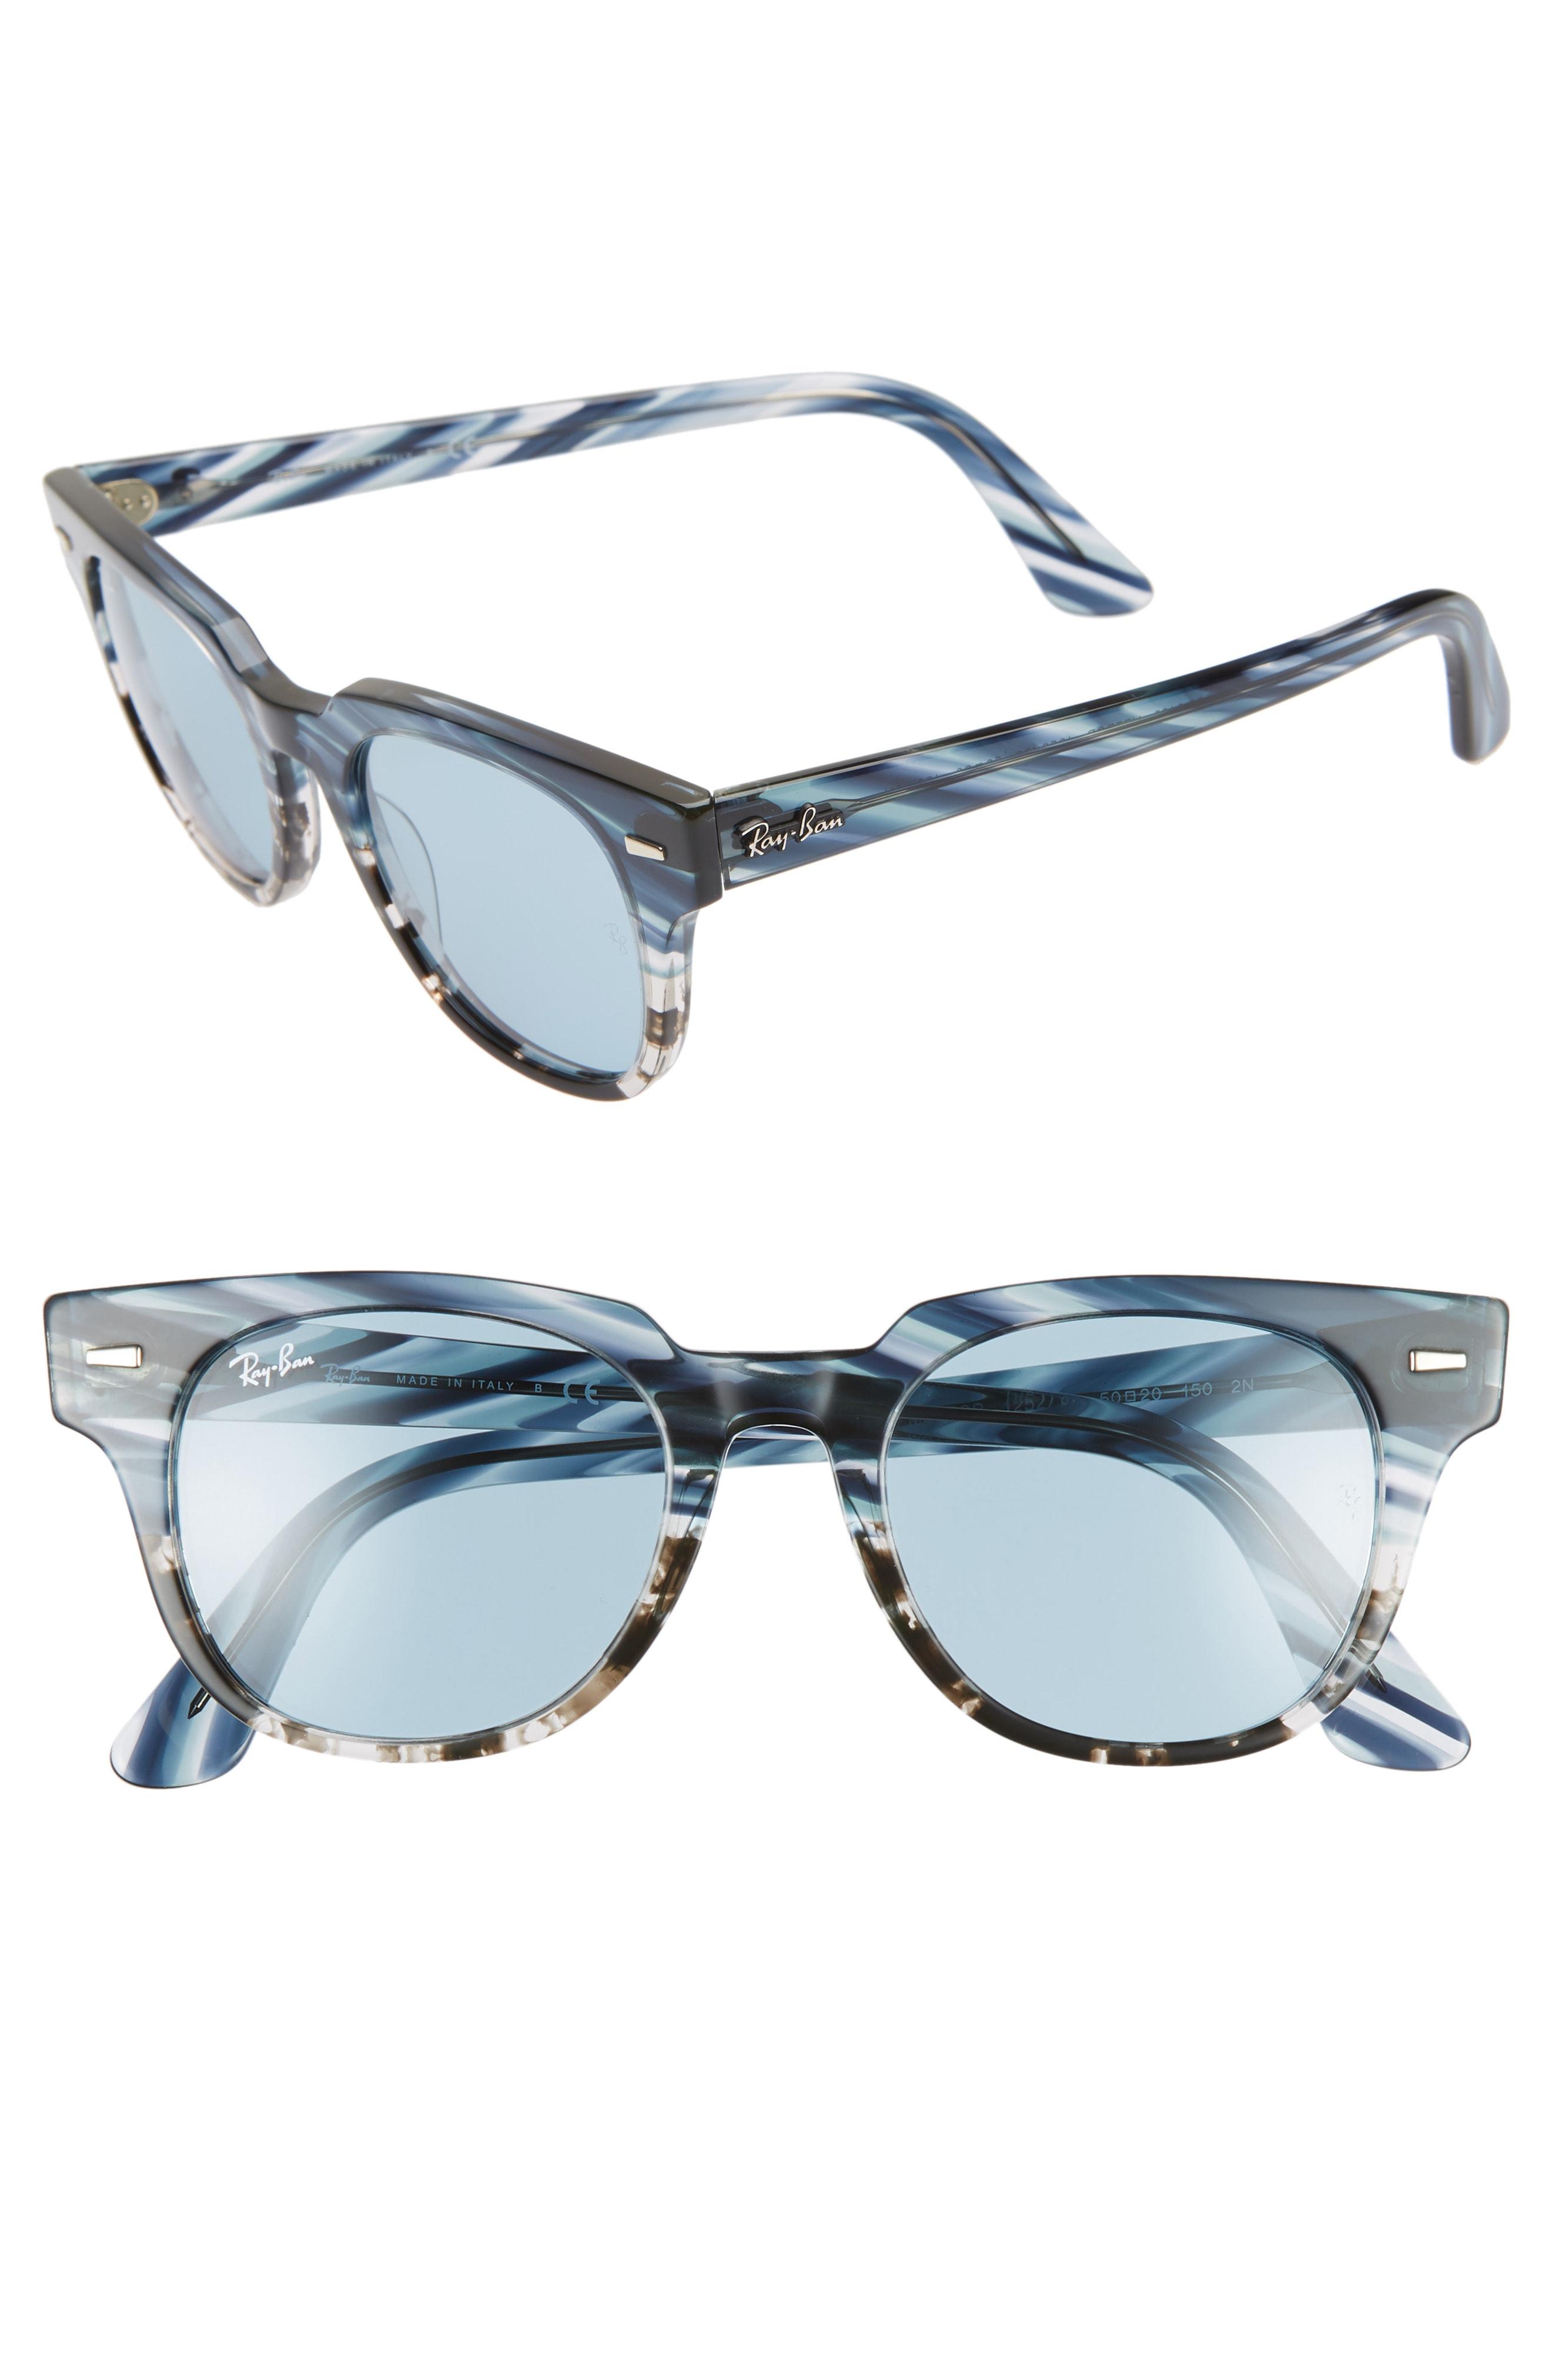 Ray-Ban Meteor 50mm Wayfarer Sunglasses